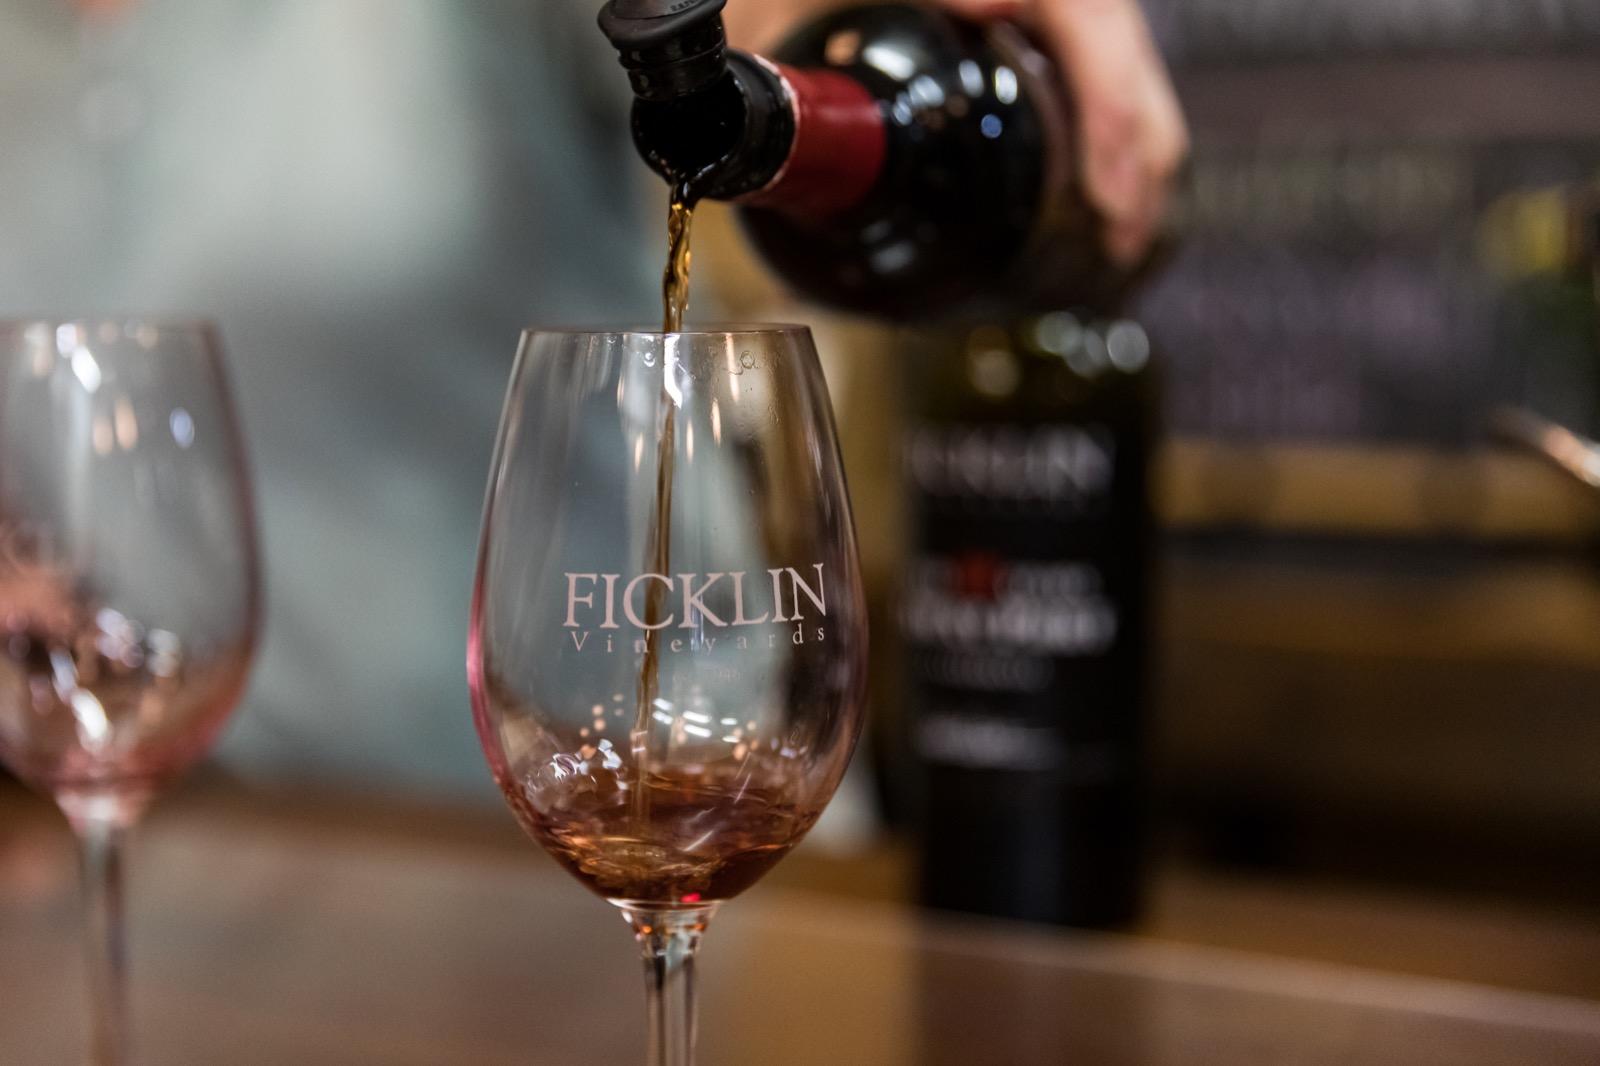 Ficklin Vineyards along the Madera Wine Trail